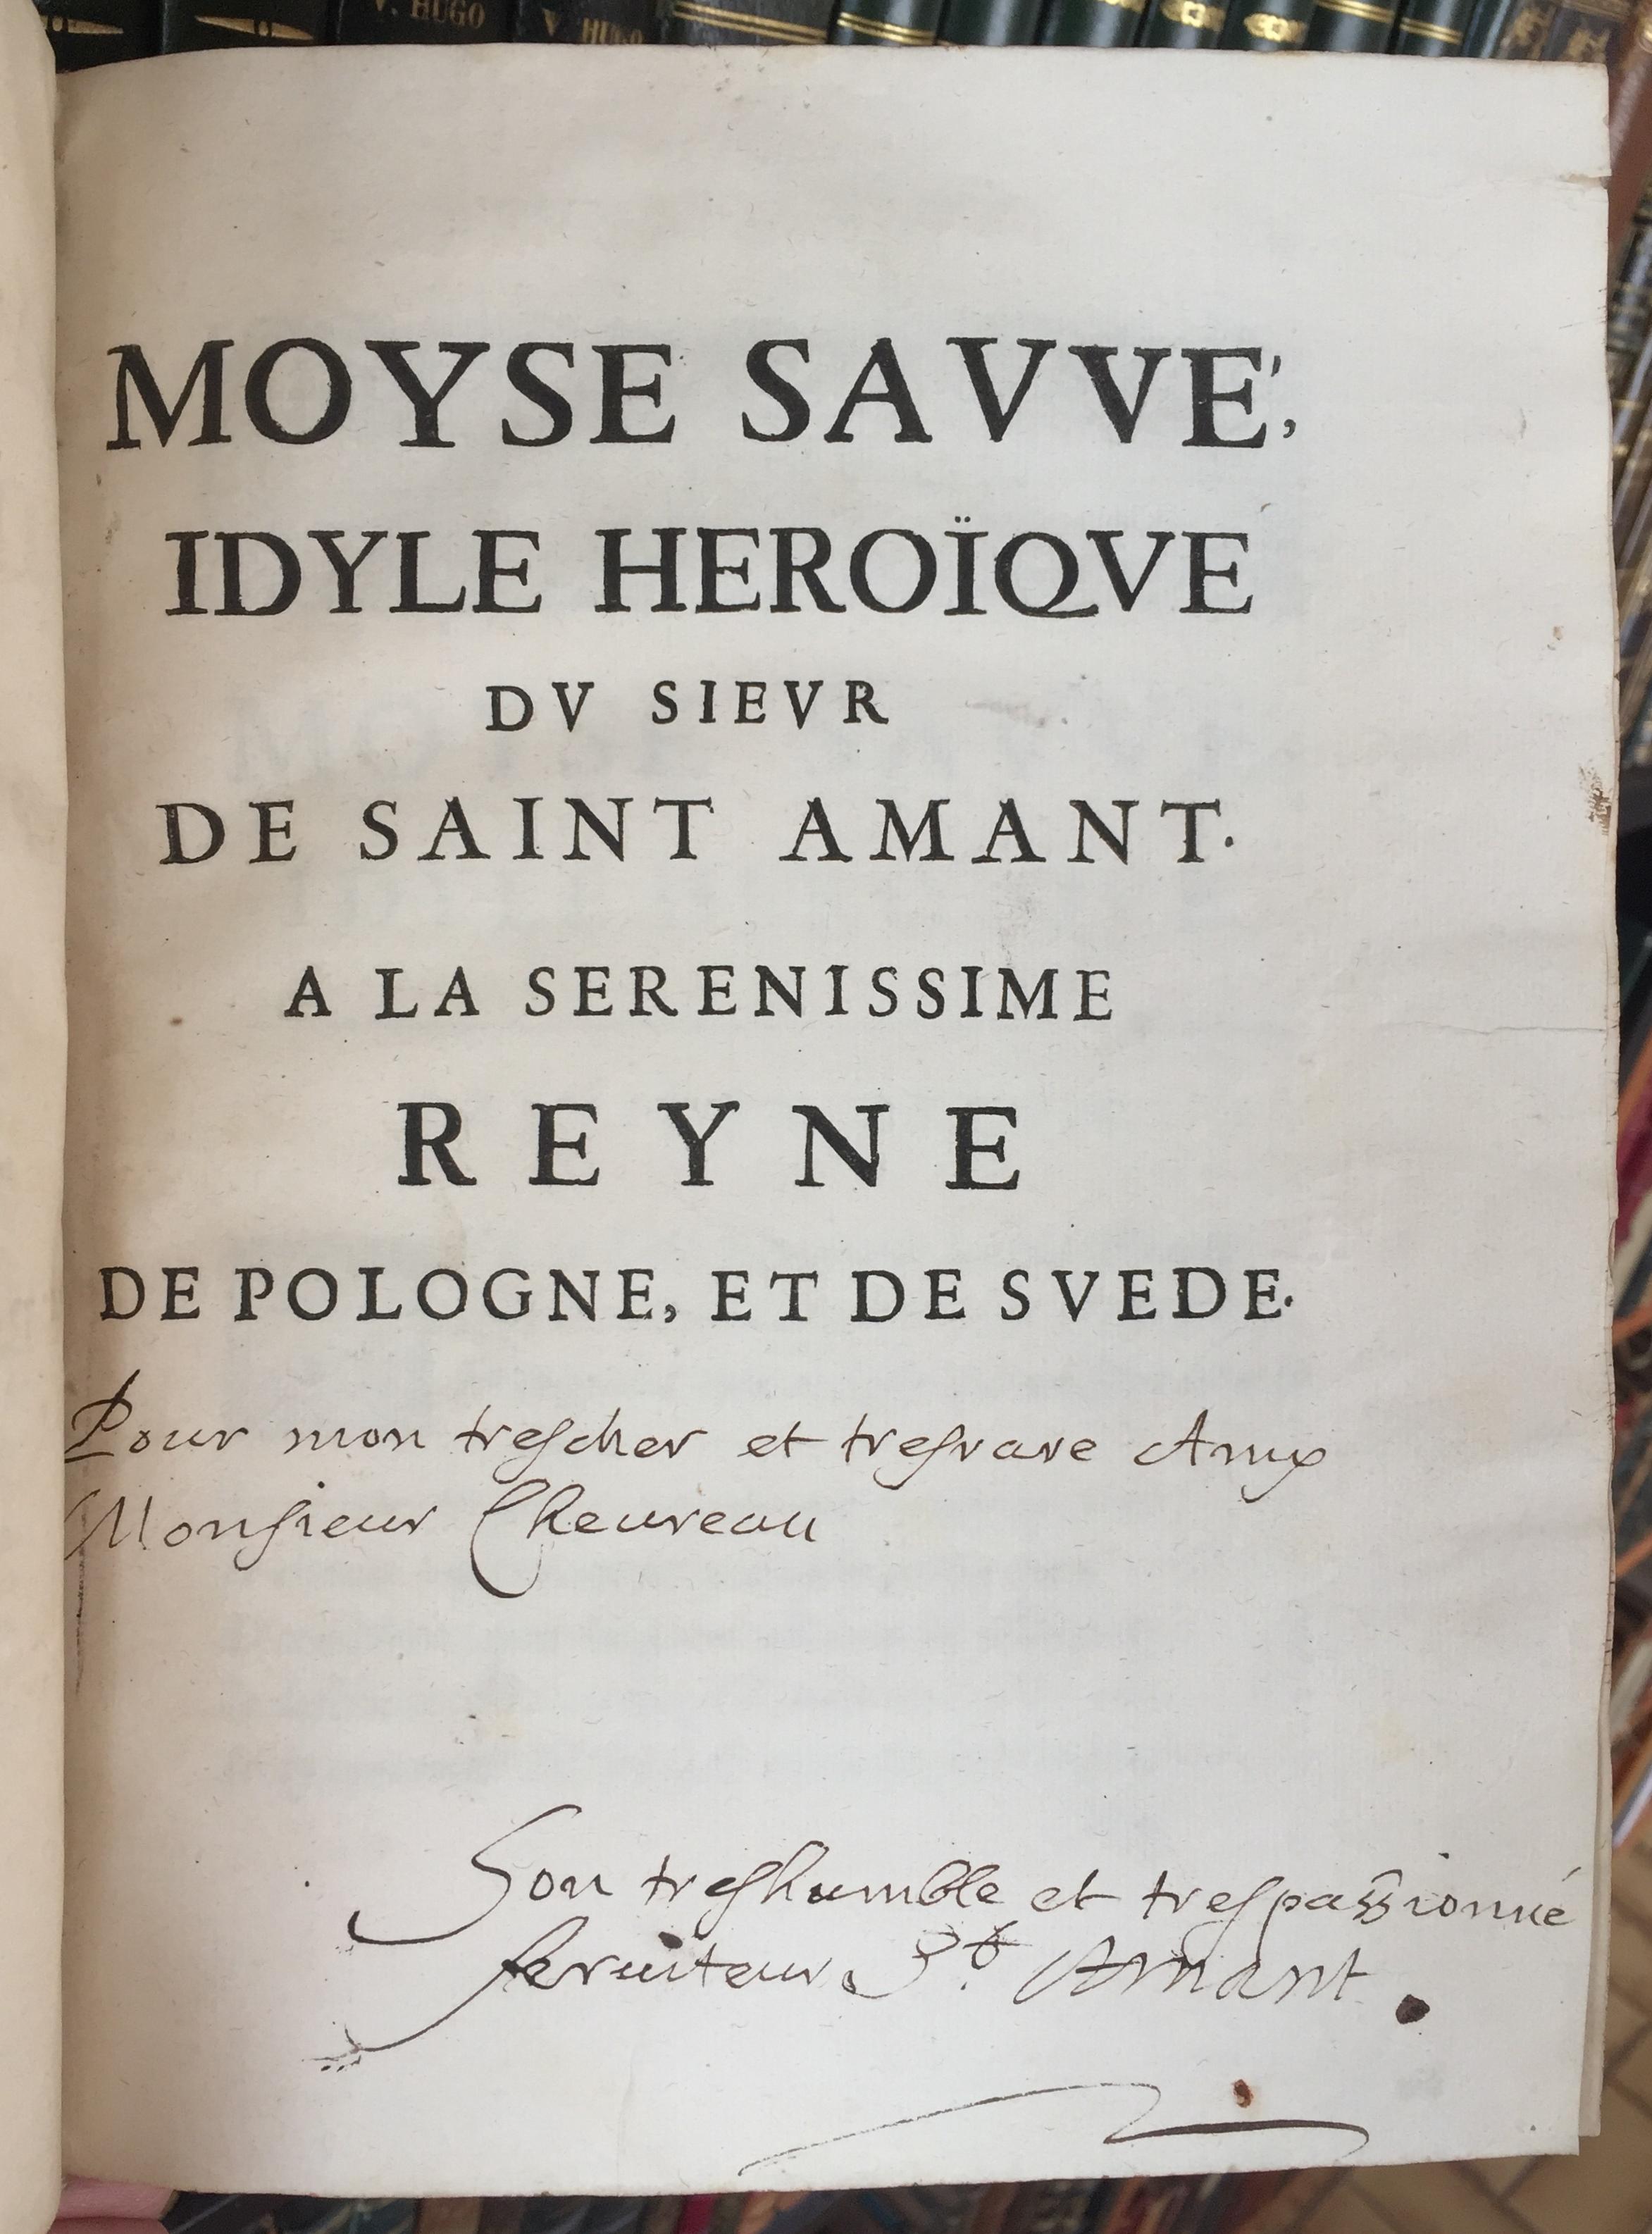 Saint Amant Melanges Tires Dune Petite Bibliotheque